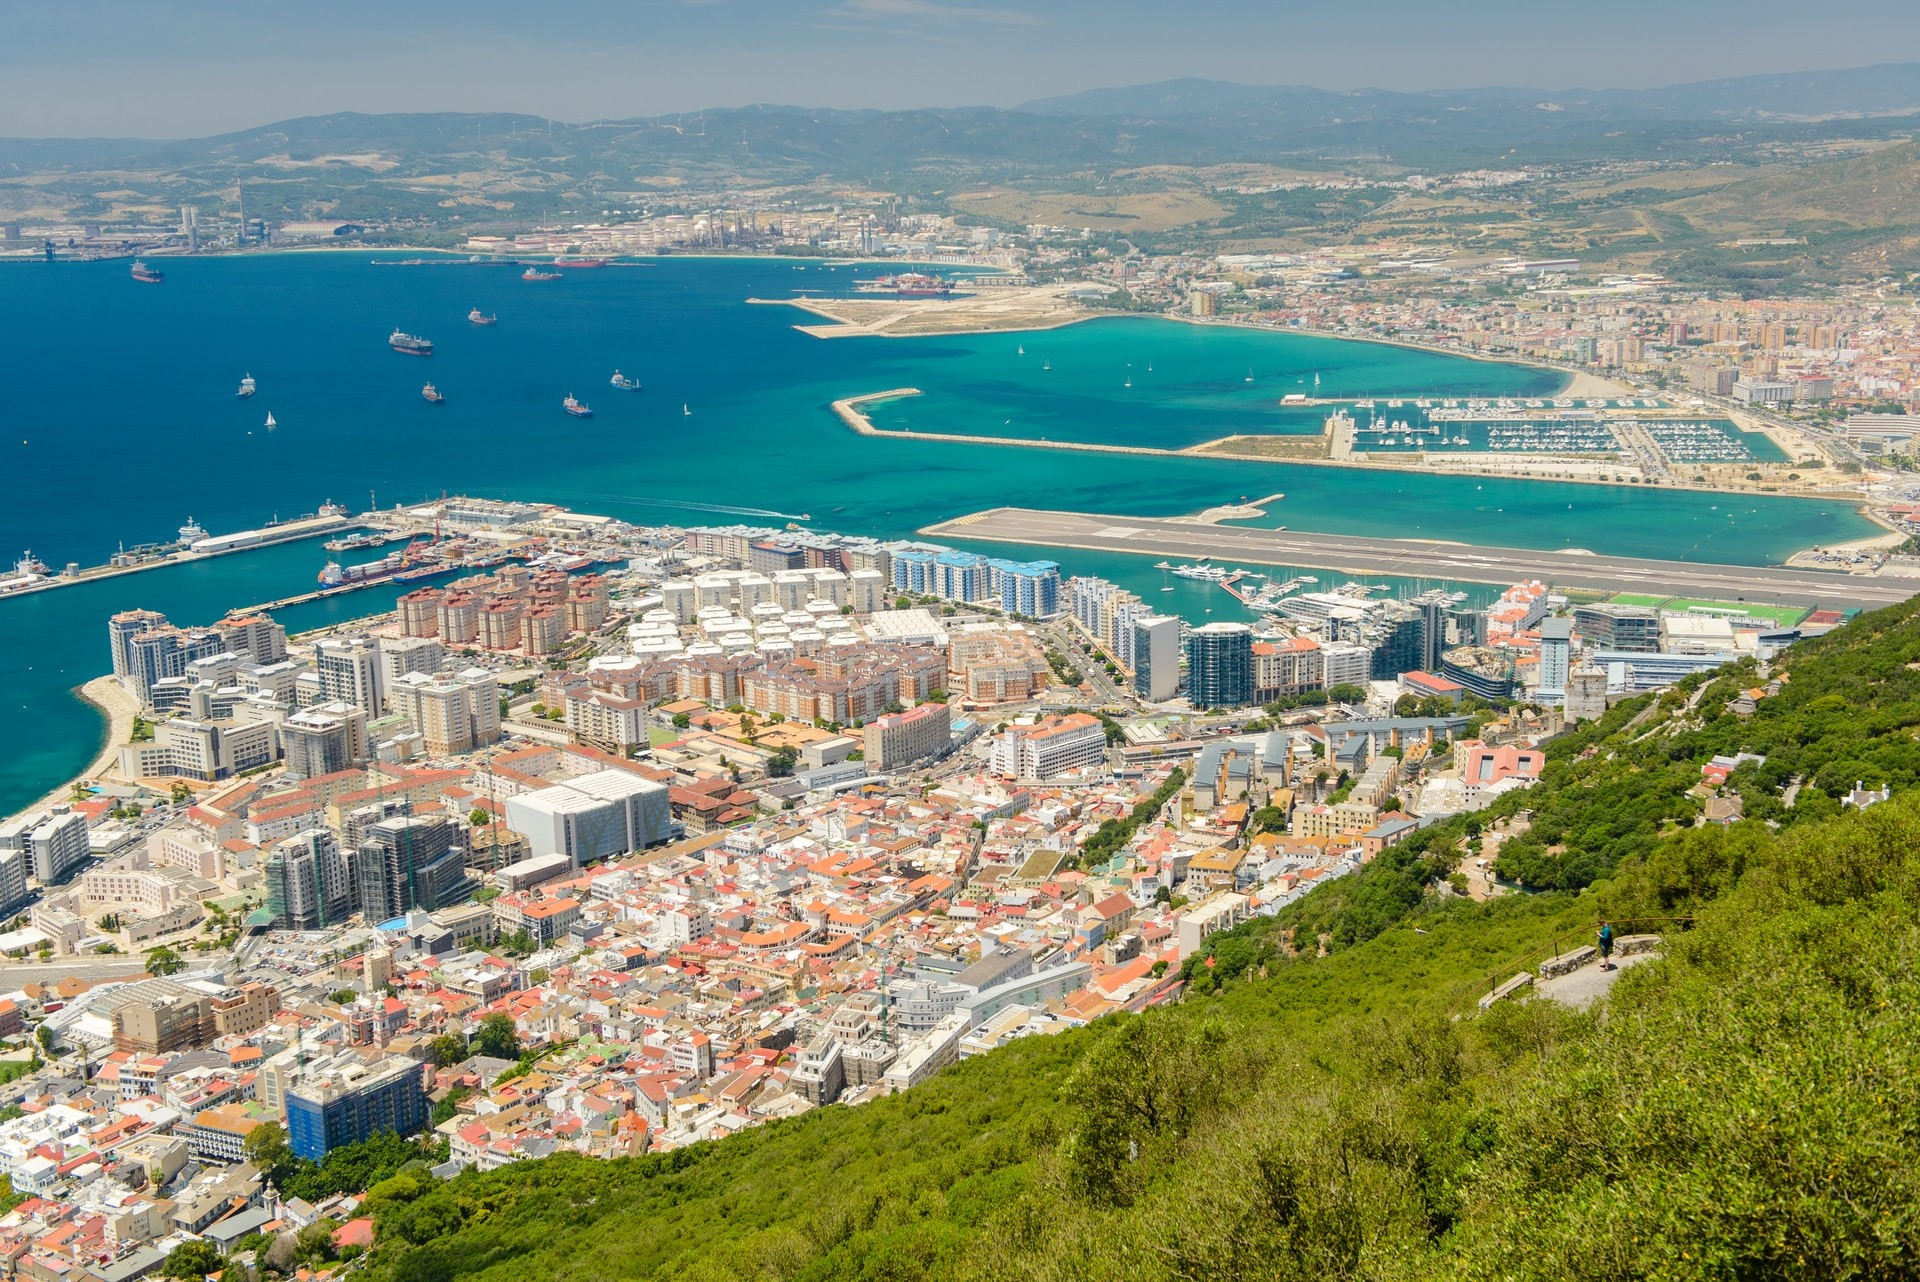 City of Gibraltar